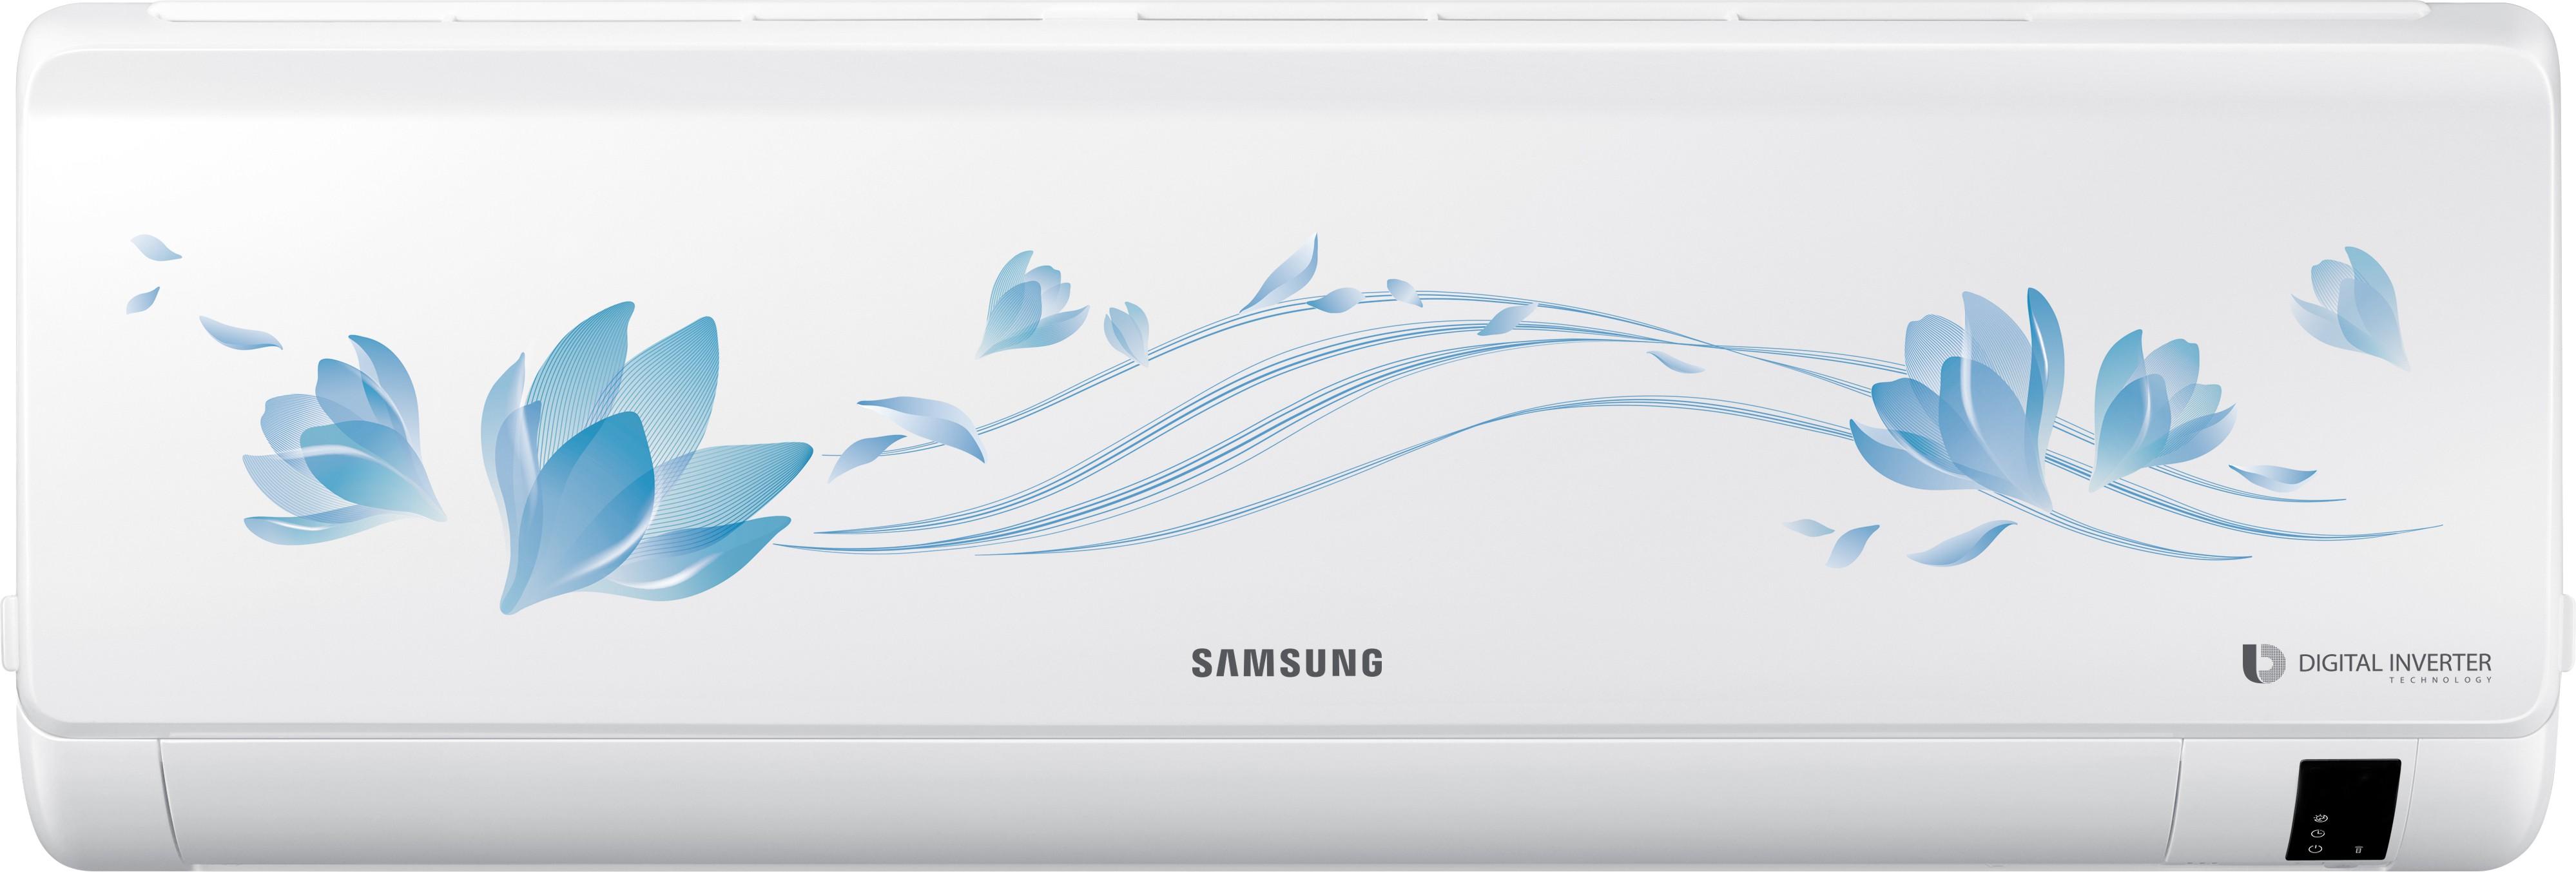 Samsung AR18NV3HETU 1.5 Ton 3 Star BEE Rating 2018 Inverter AC Image